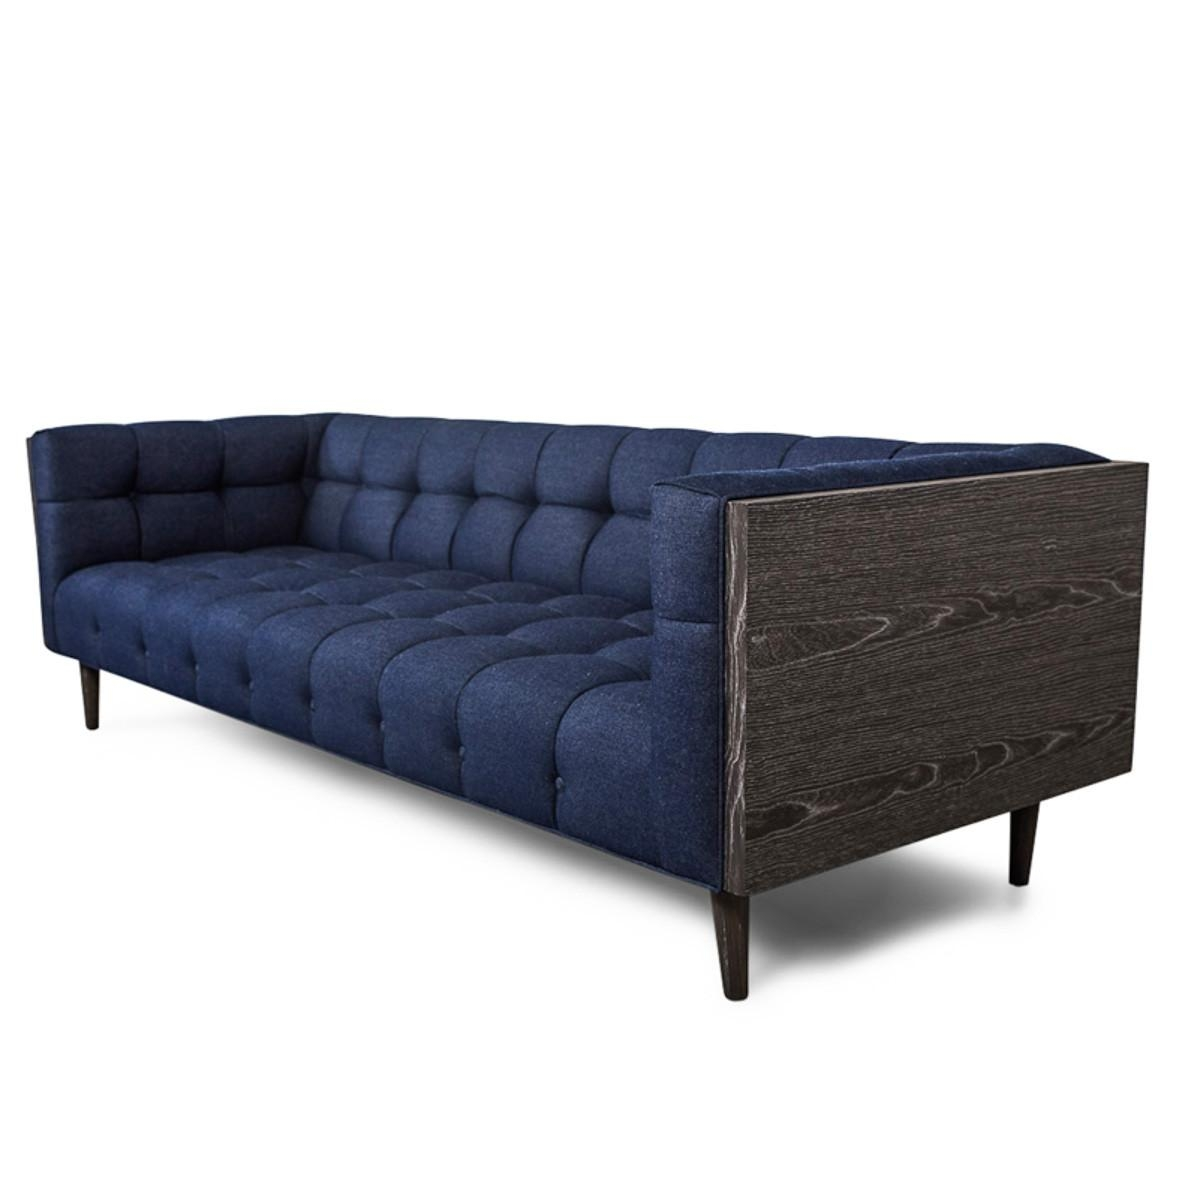 cheap mid century sofas carol bolton sofa 2019 latest retro ideas